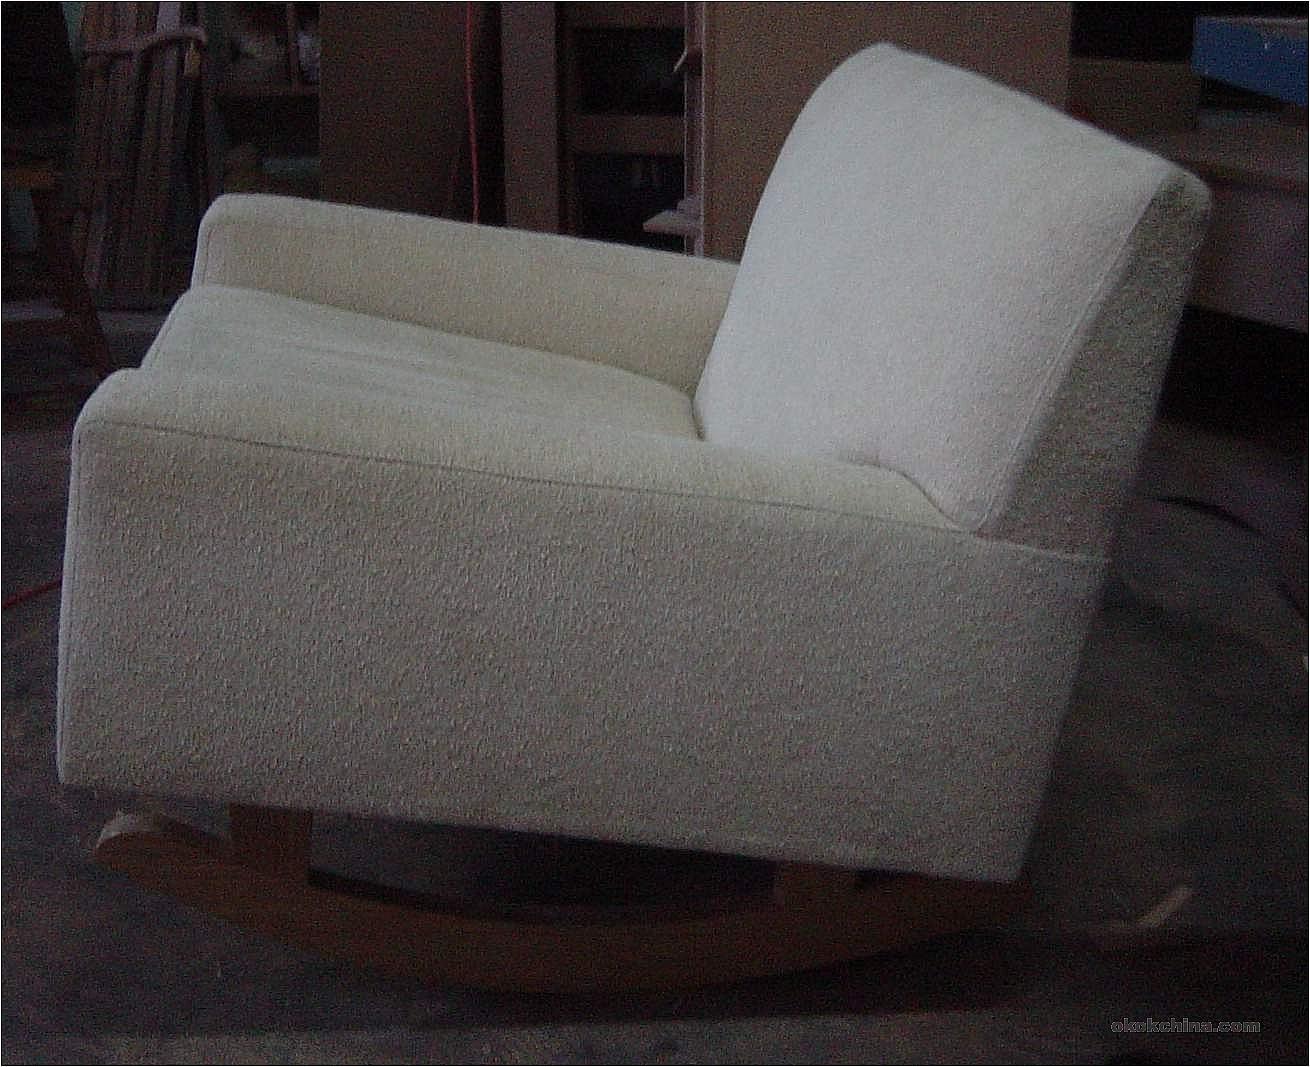 Rocking Sofa | Tehranmix Decoration For Sofa Rocking Chairs (Image 11 of 20)